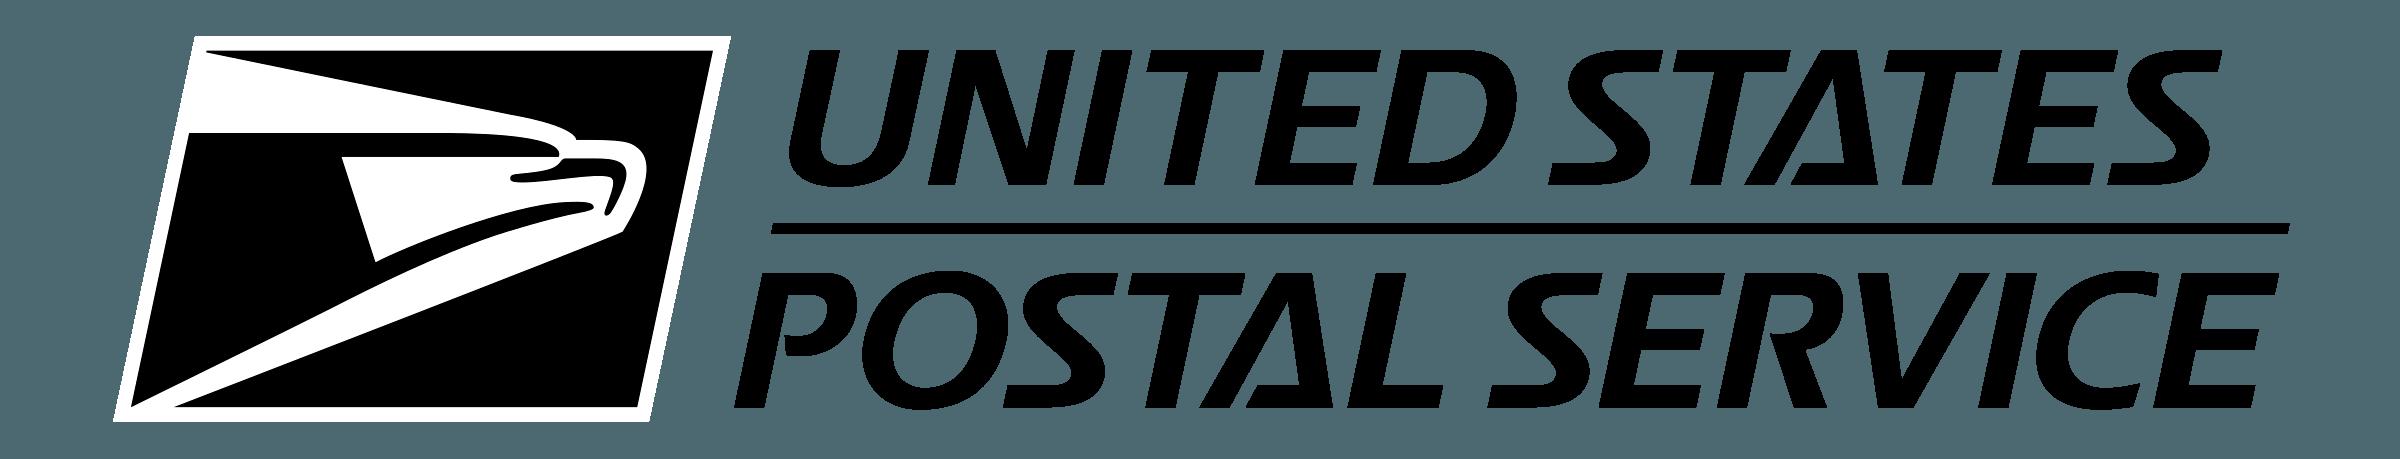 united states postal service logo png